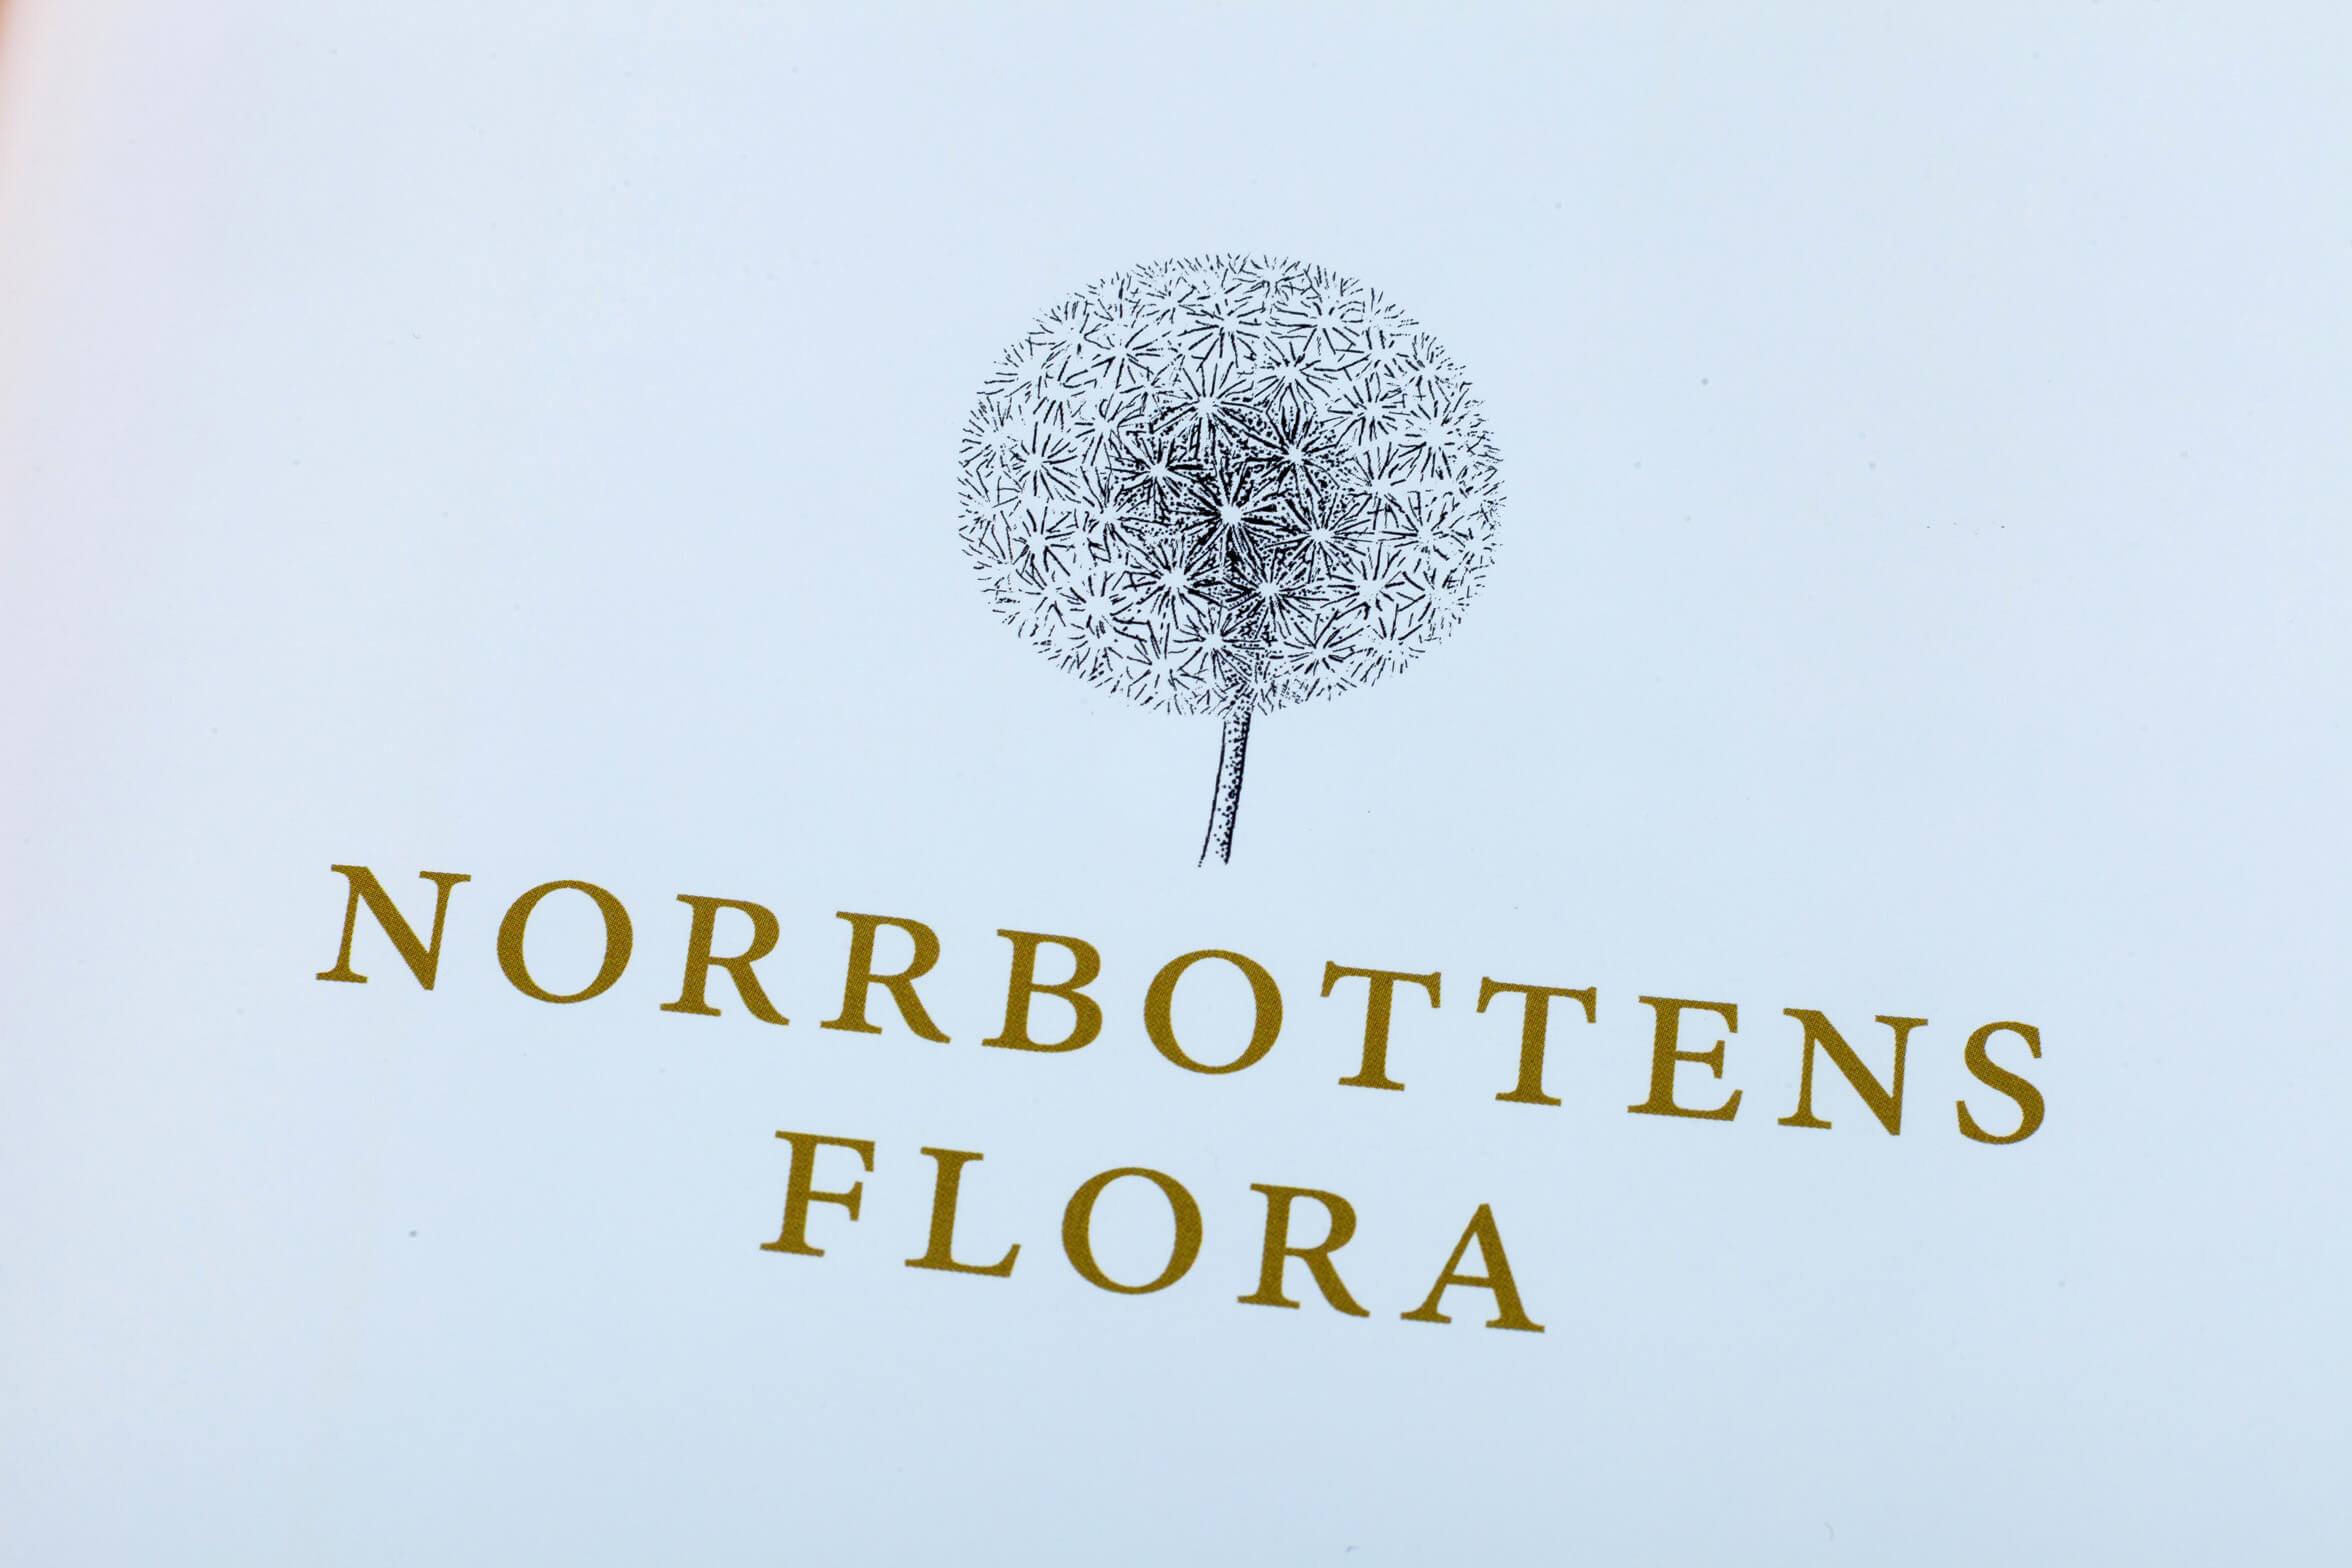 flora-iii-tin-detalj-0081_1